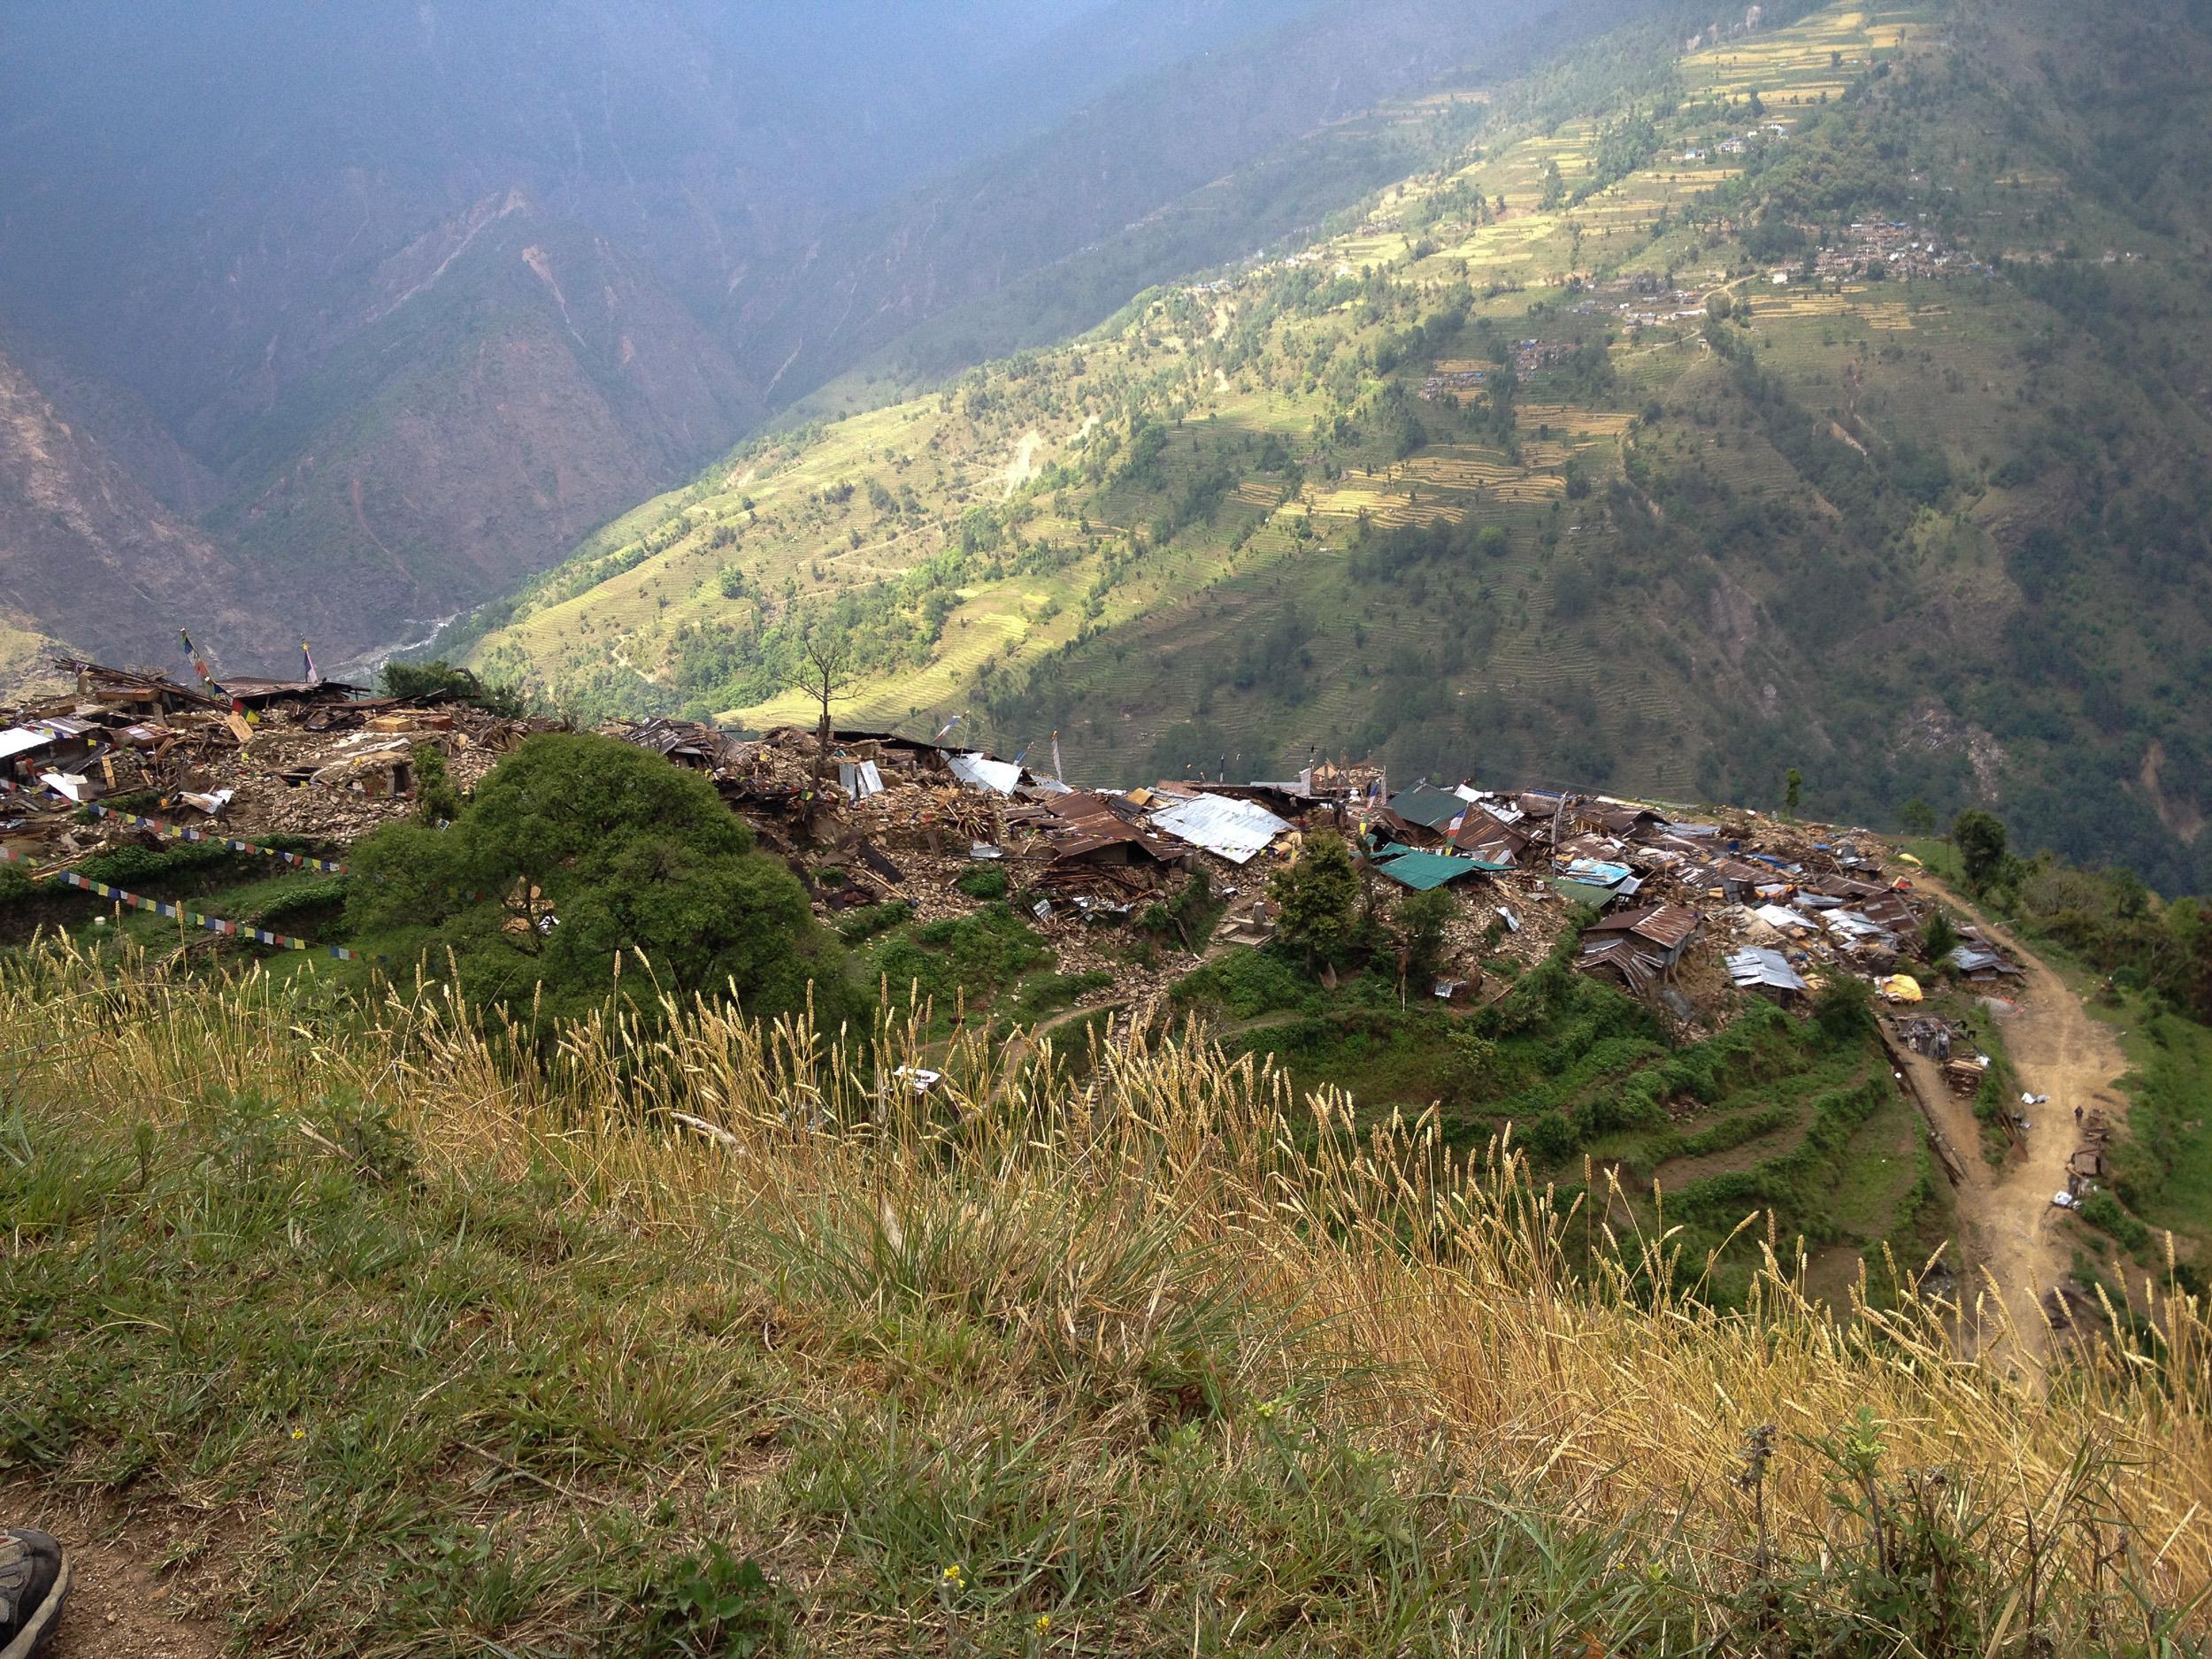 nepal_daniels-fotos_IMG_5212.jpg